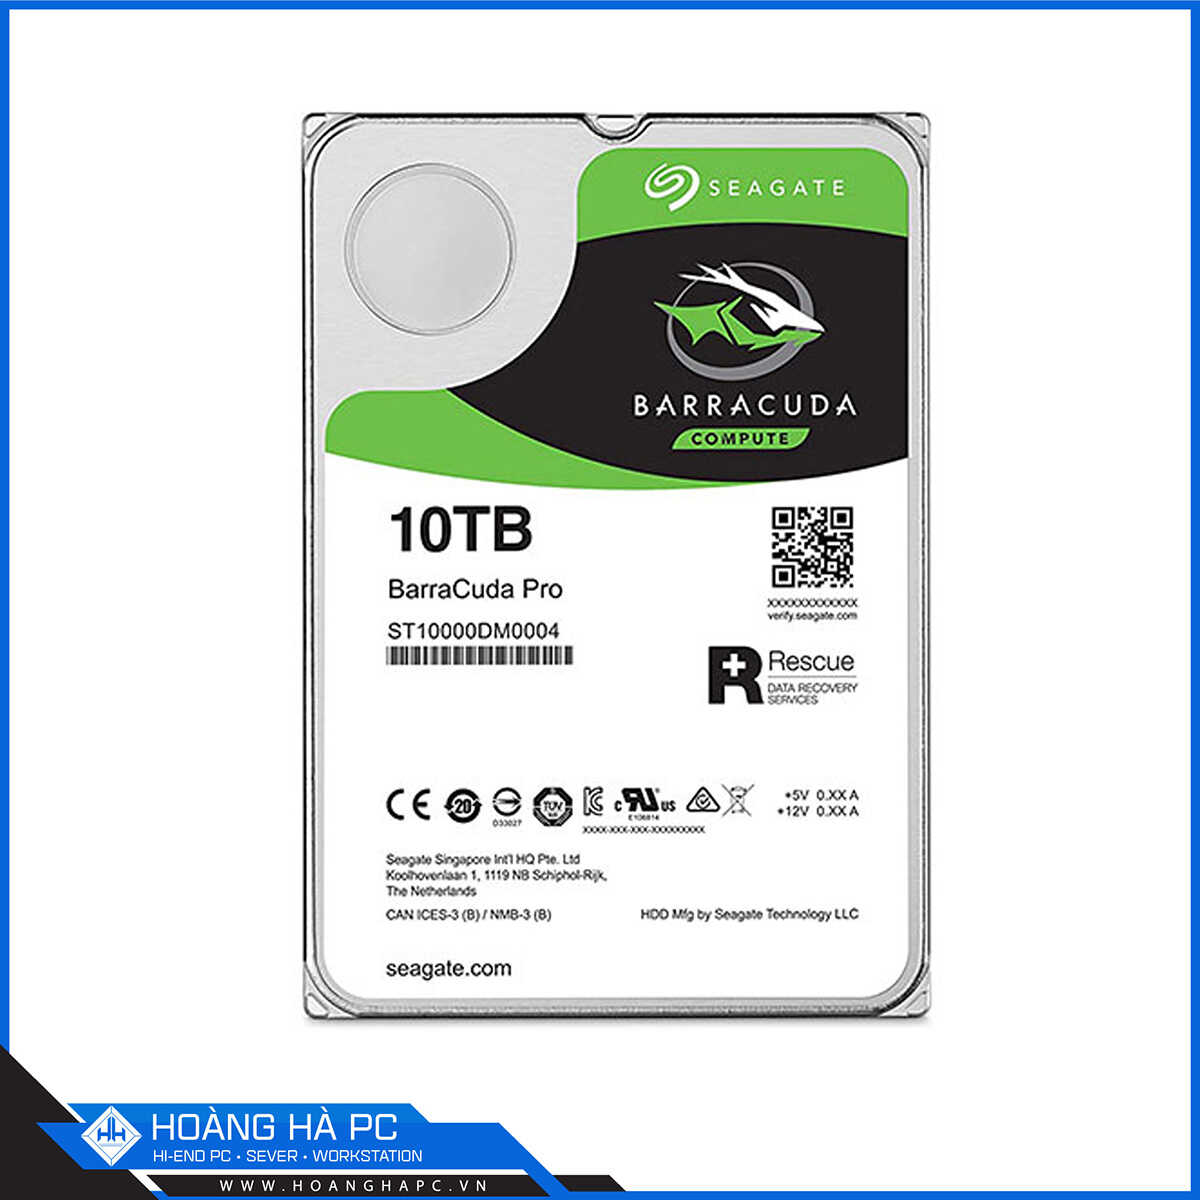 Ổ Cứng HDD Seagate Barracuda Pro 10TB